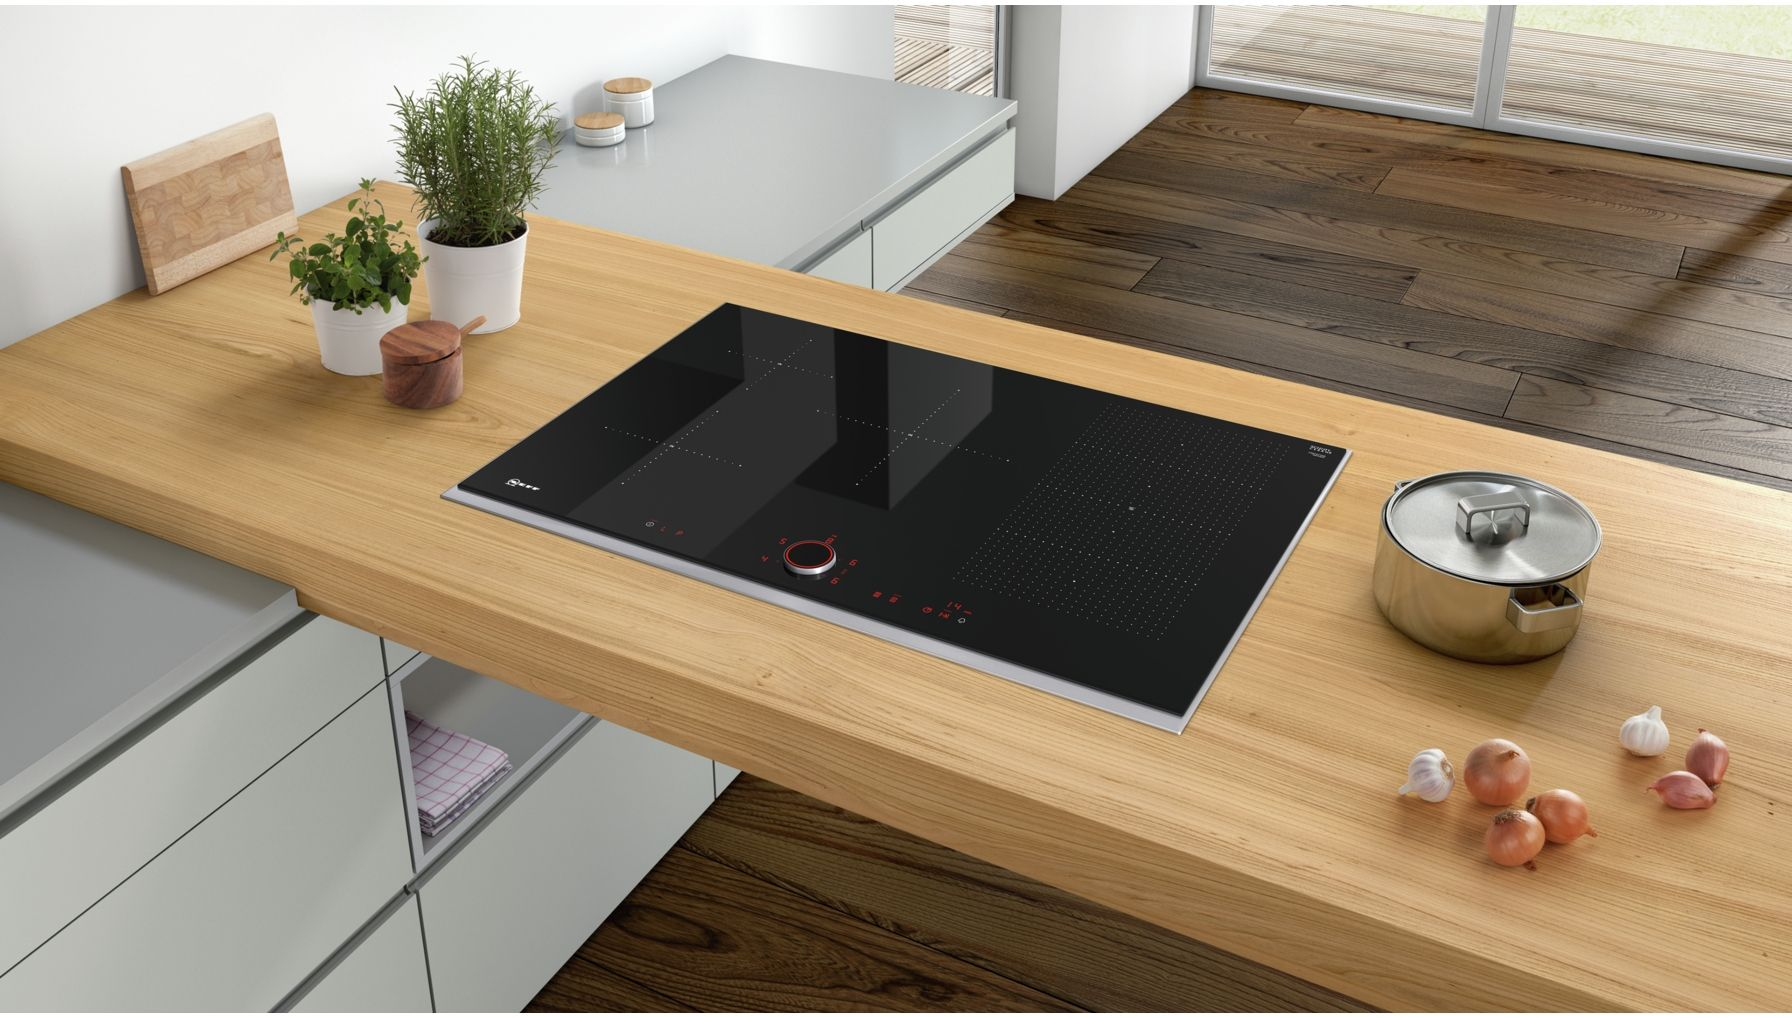 NEFF | PRODOTTI - Piani cottura un INDUZIONE - - T58TS21N0 cucina ...